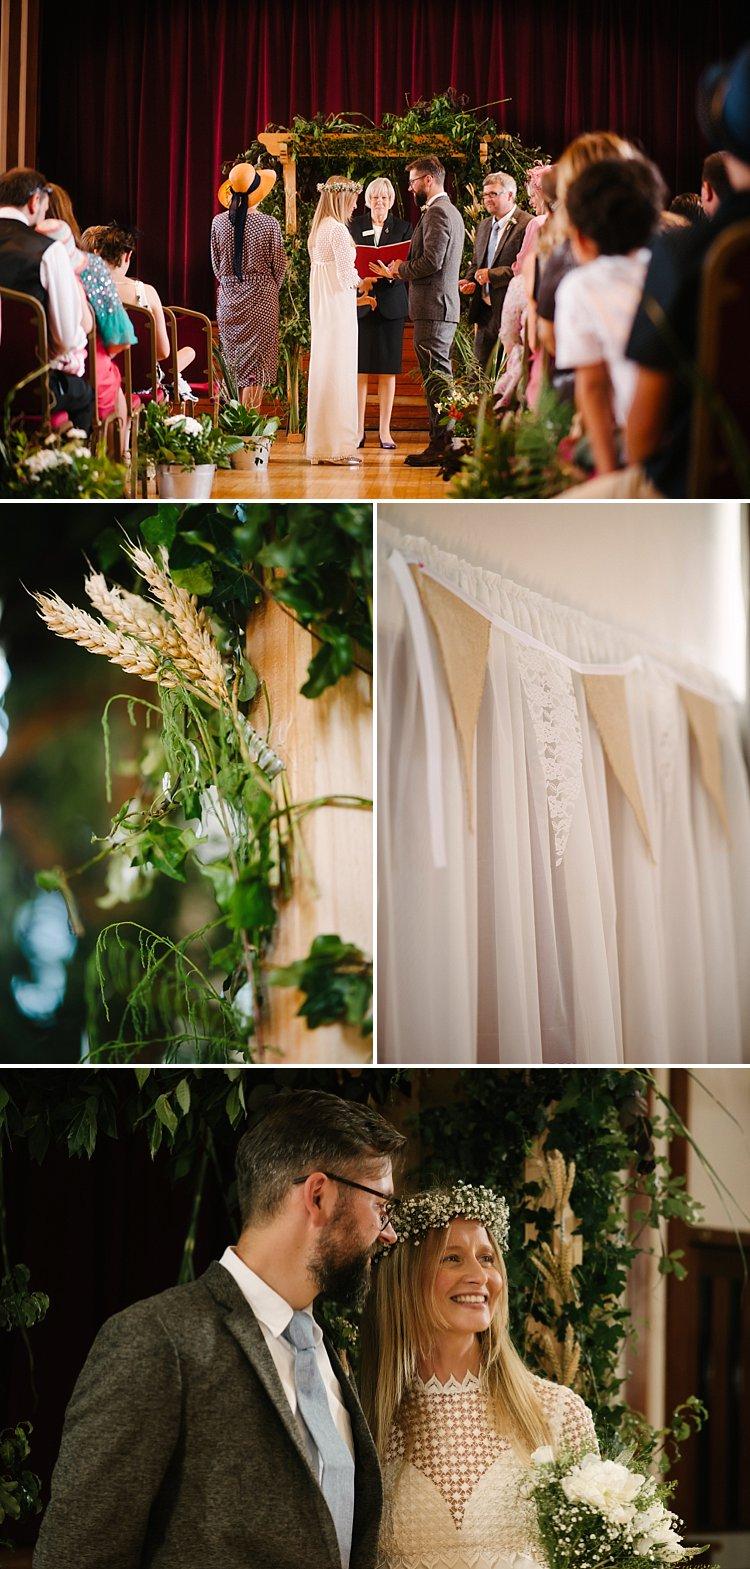 London wedding photographer farm bohemian marquee boho peterborough lincolnshire groovy farm foods chris elly 0005